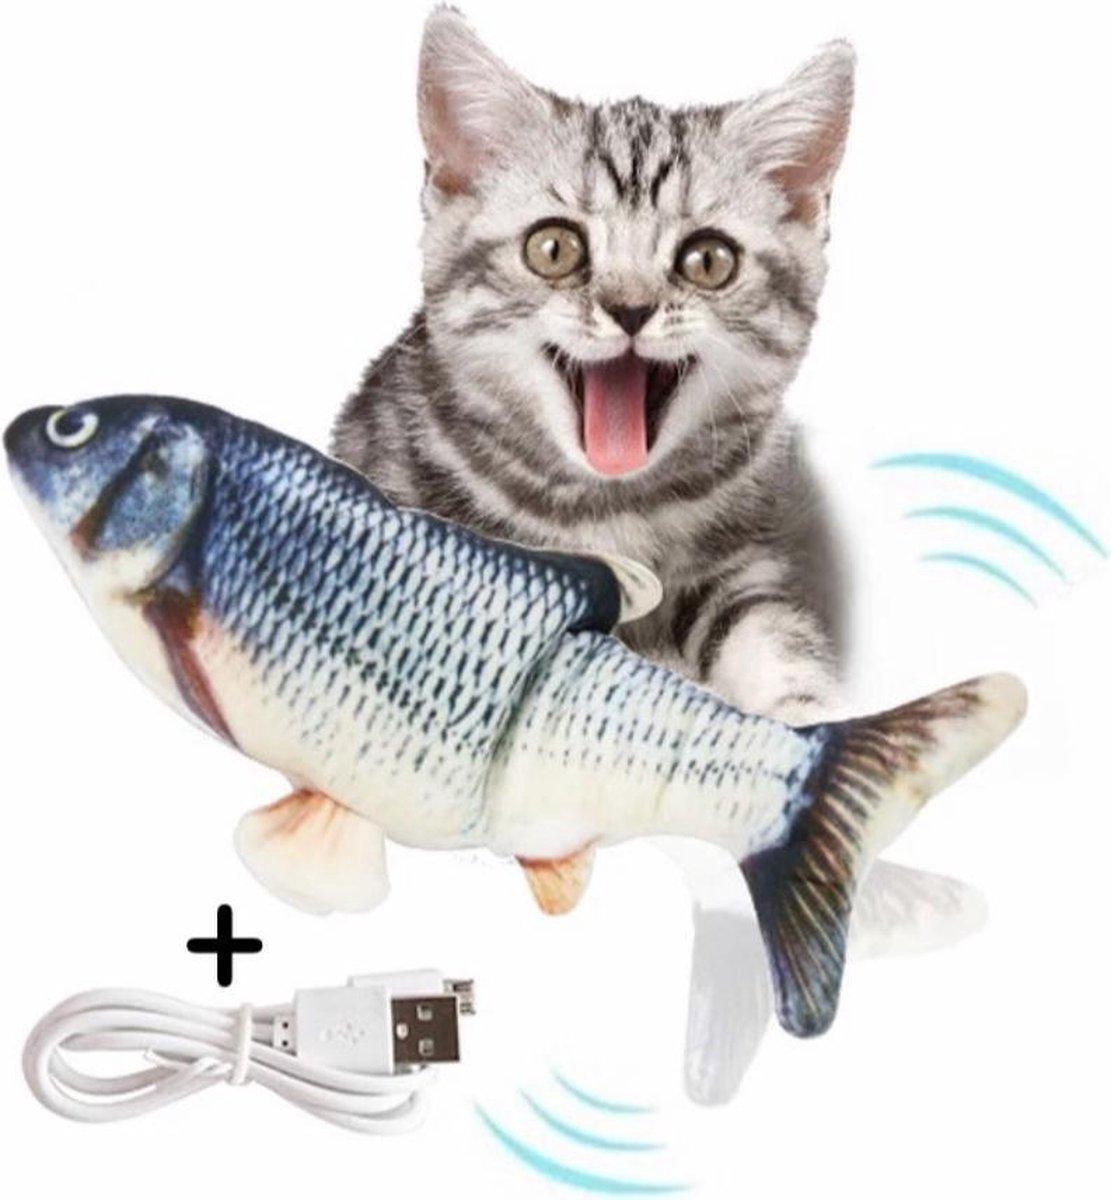 Kattenspeeltjes – Bewegende Vis met Catnip Kattenkruid – Kattenspeelgoed Intelligentie – Speelgoed K